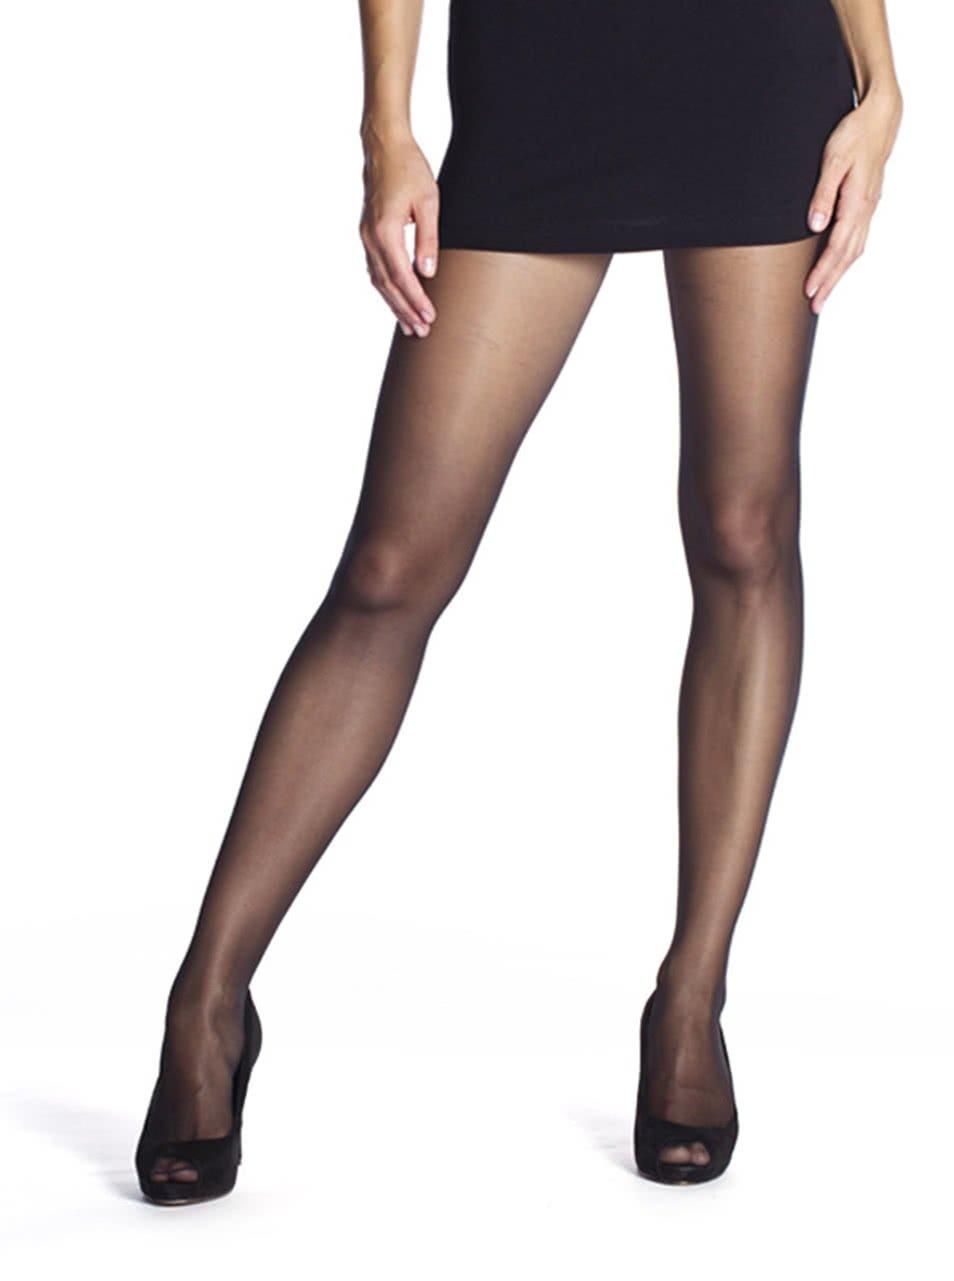 Černé punčochové kalhoty Bellinda Fascination Matt 15 DEN